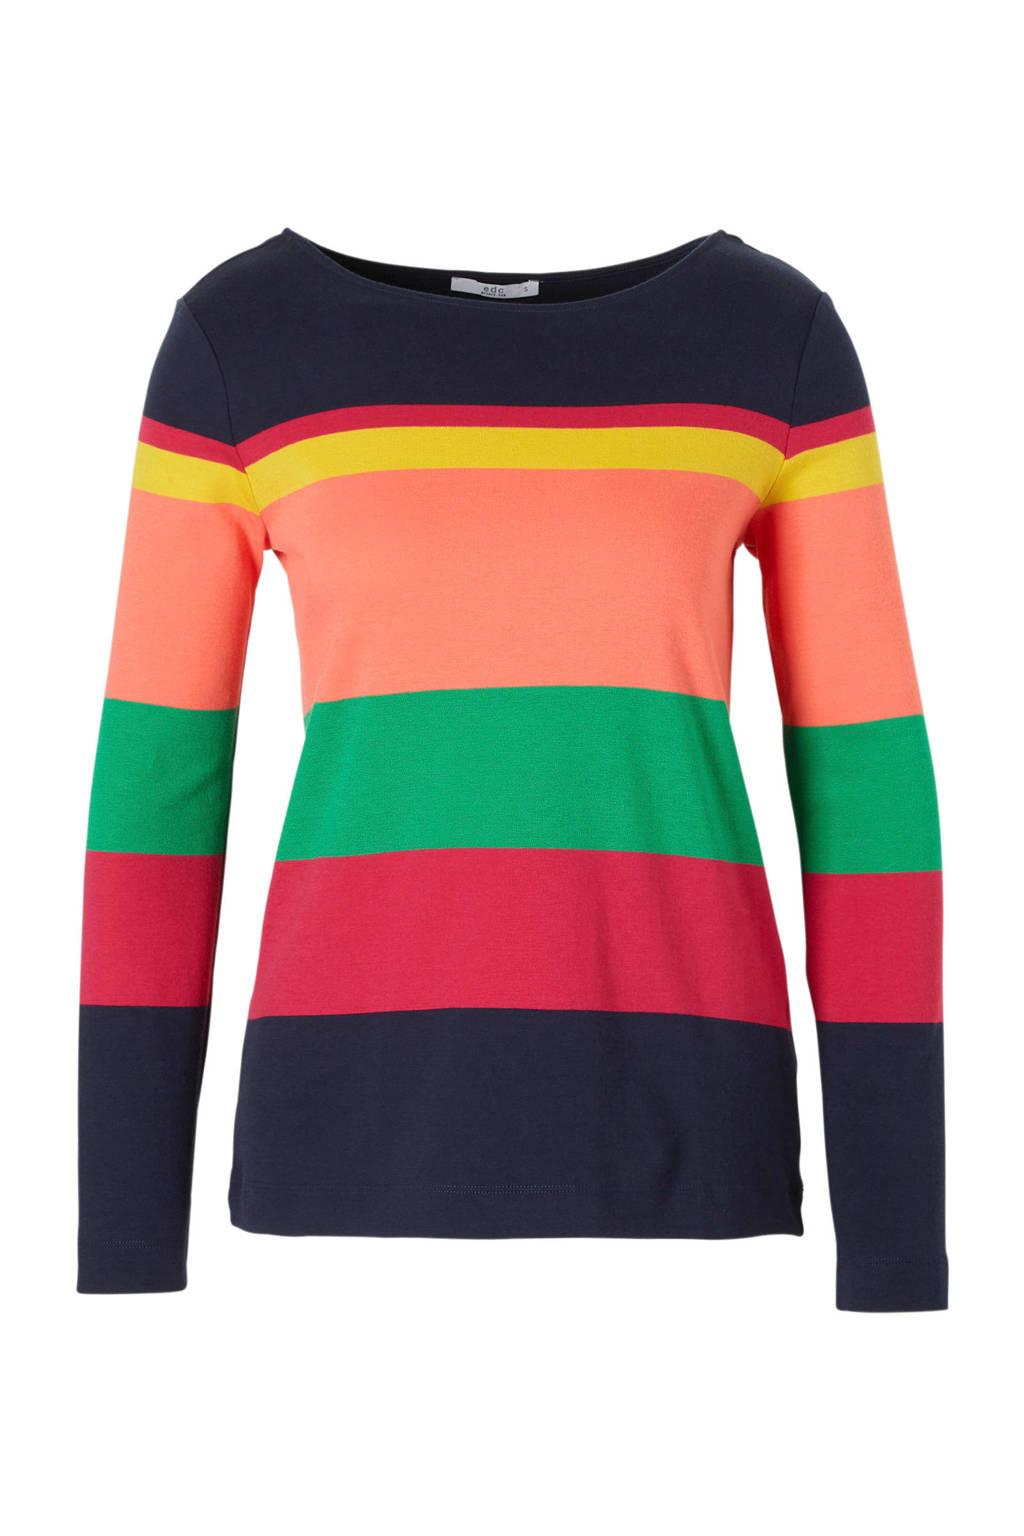 edc Women gestreepte top, Donkerblauw/groen/roze/oranje